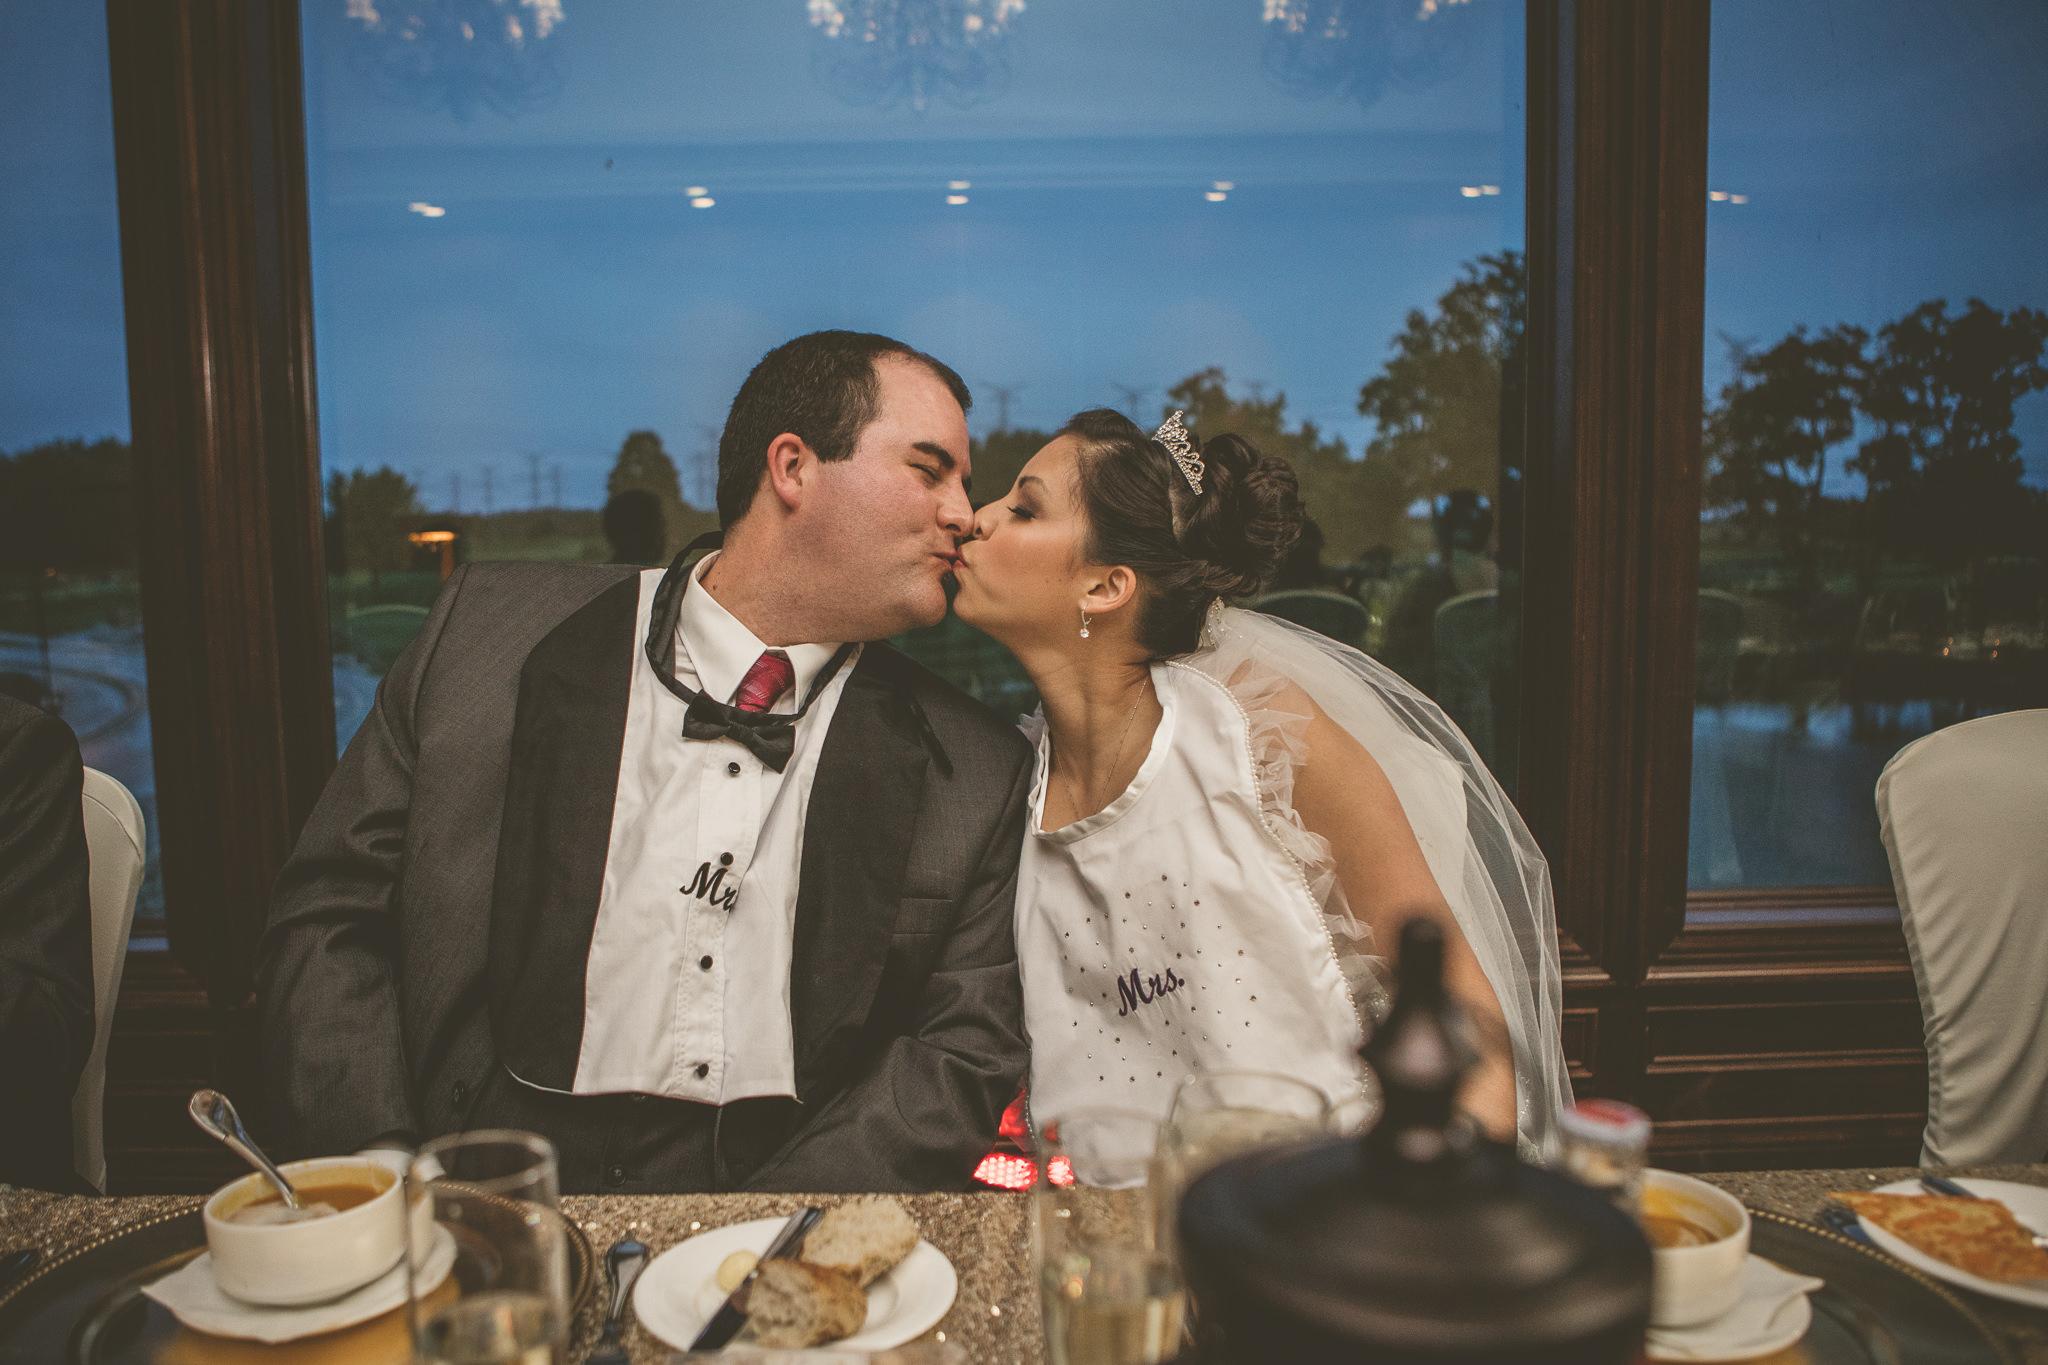 deer creek banquet facility wedding photos 703 - Deer Creek Wedding Photos